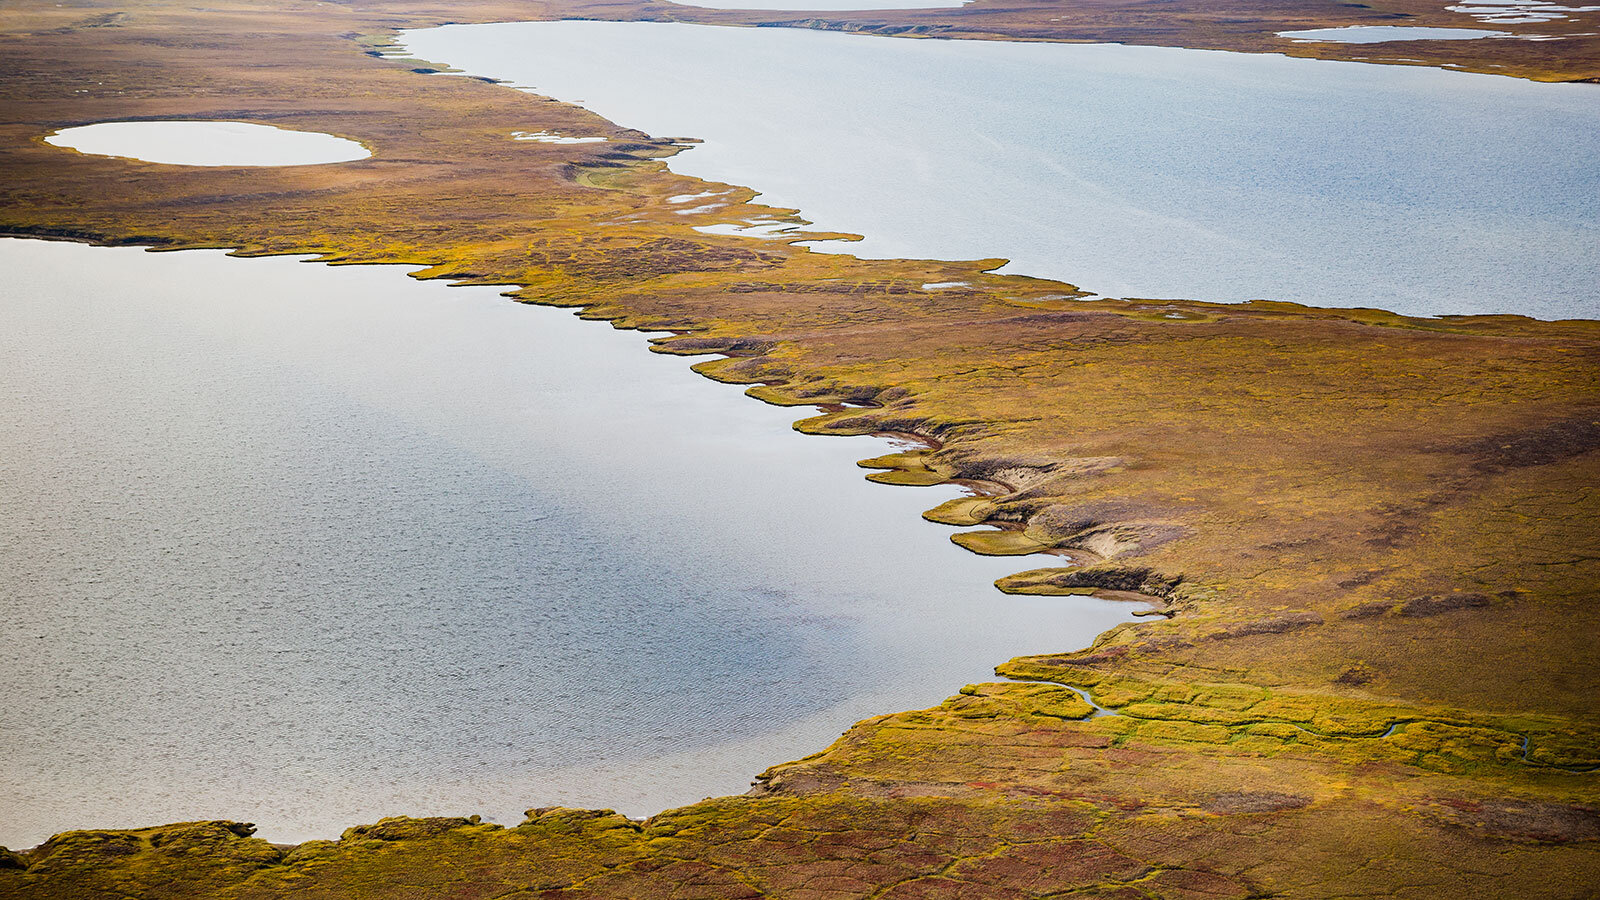 NASA flights detect millions of Arctic methane hotspots